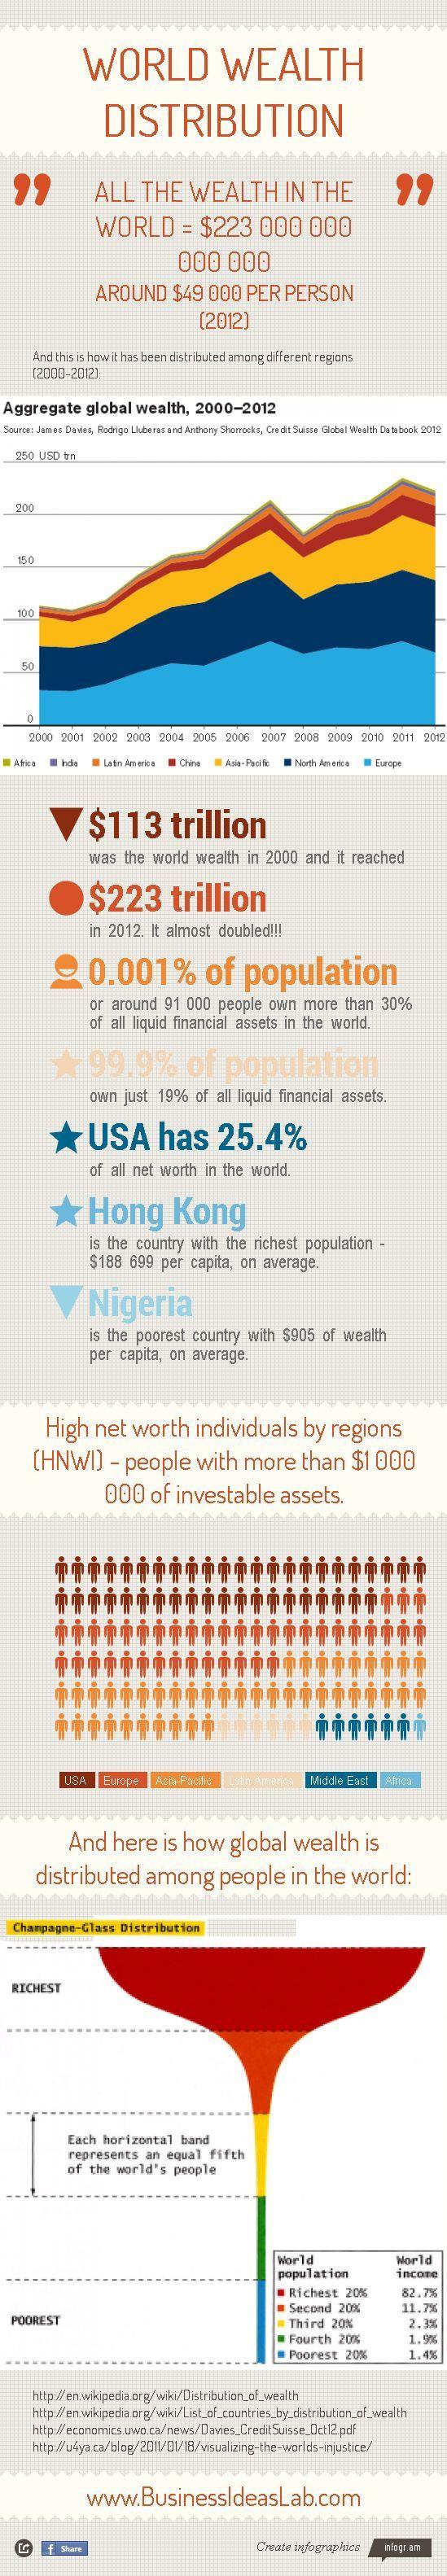 World Wealth Distribution